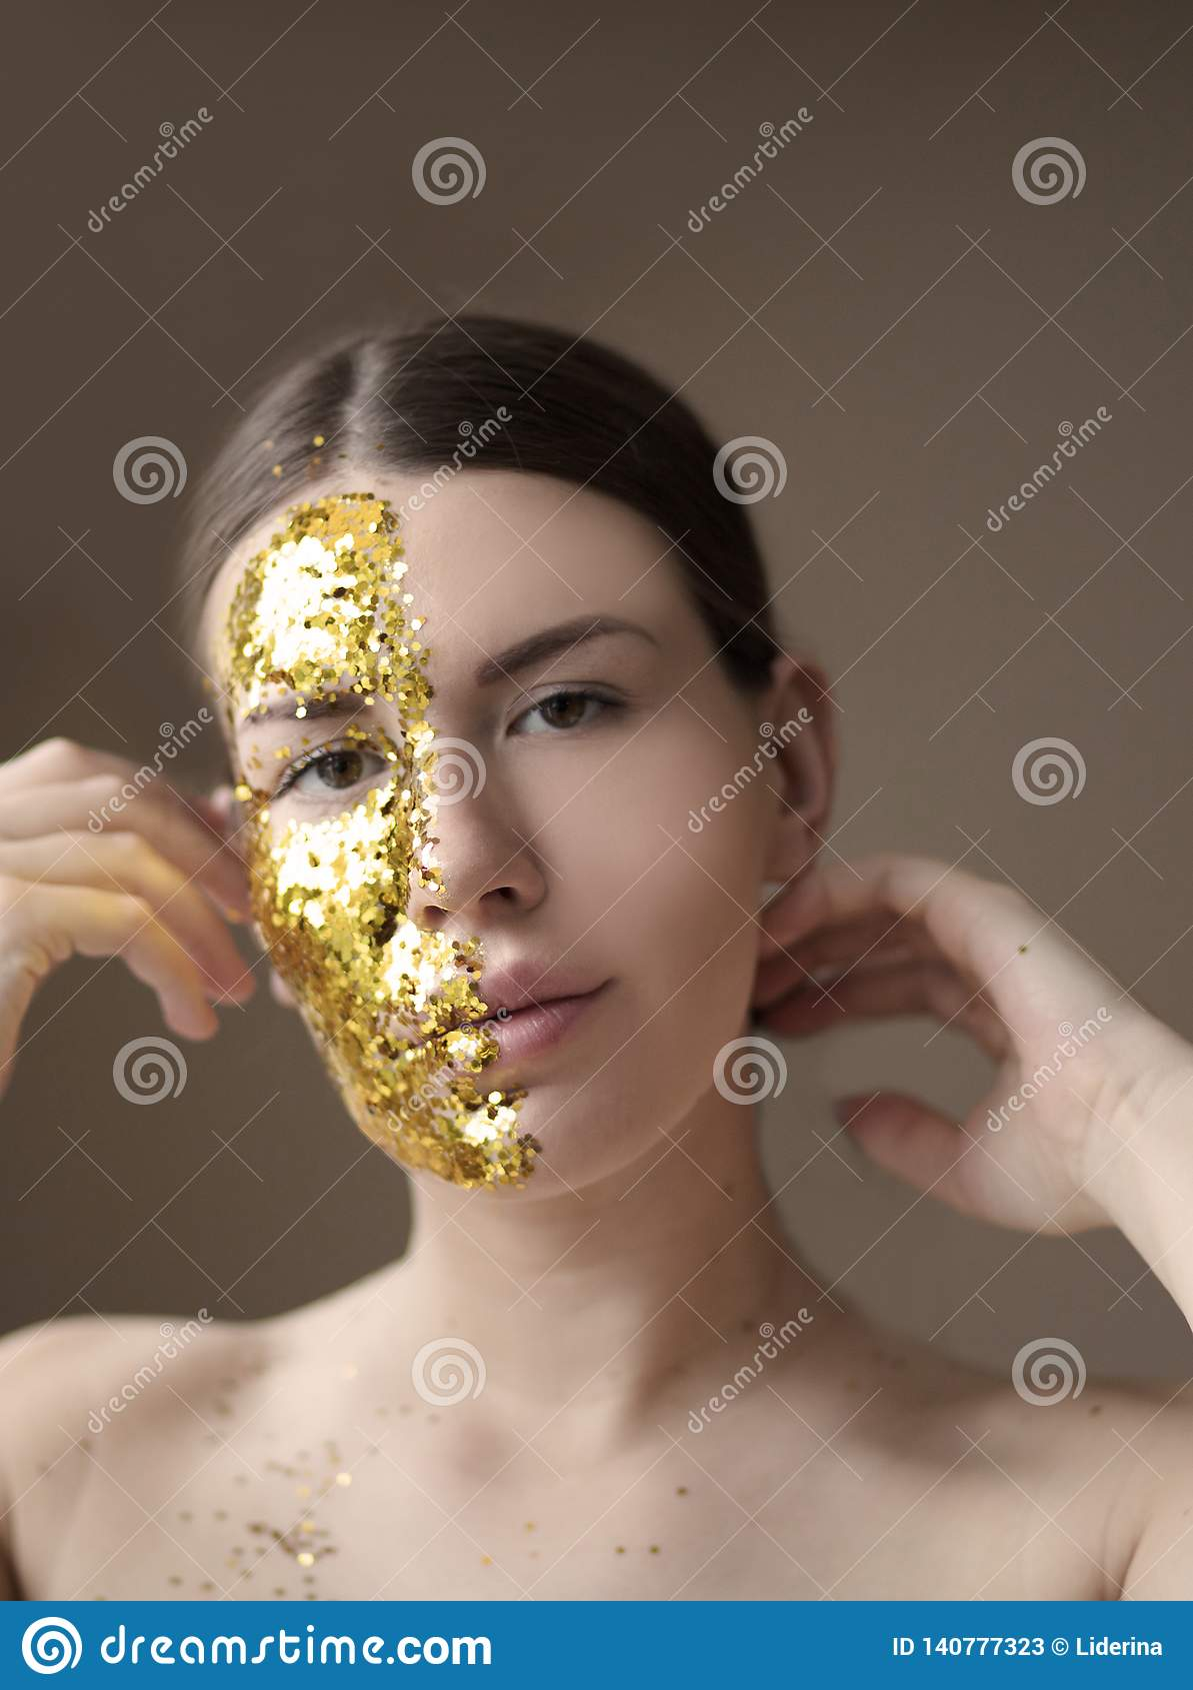 Let Them Admire Your Golden Beauty Stock Image - Image of portrait